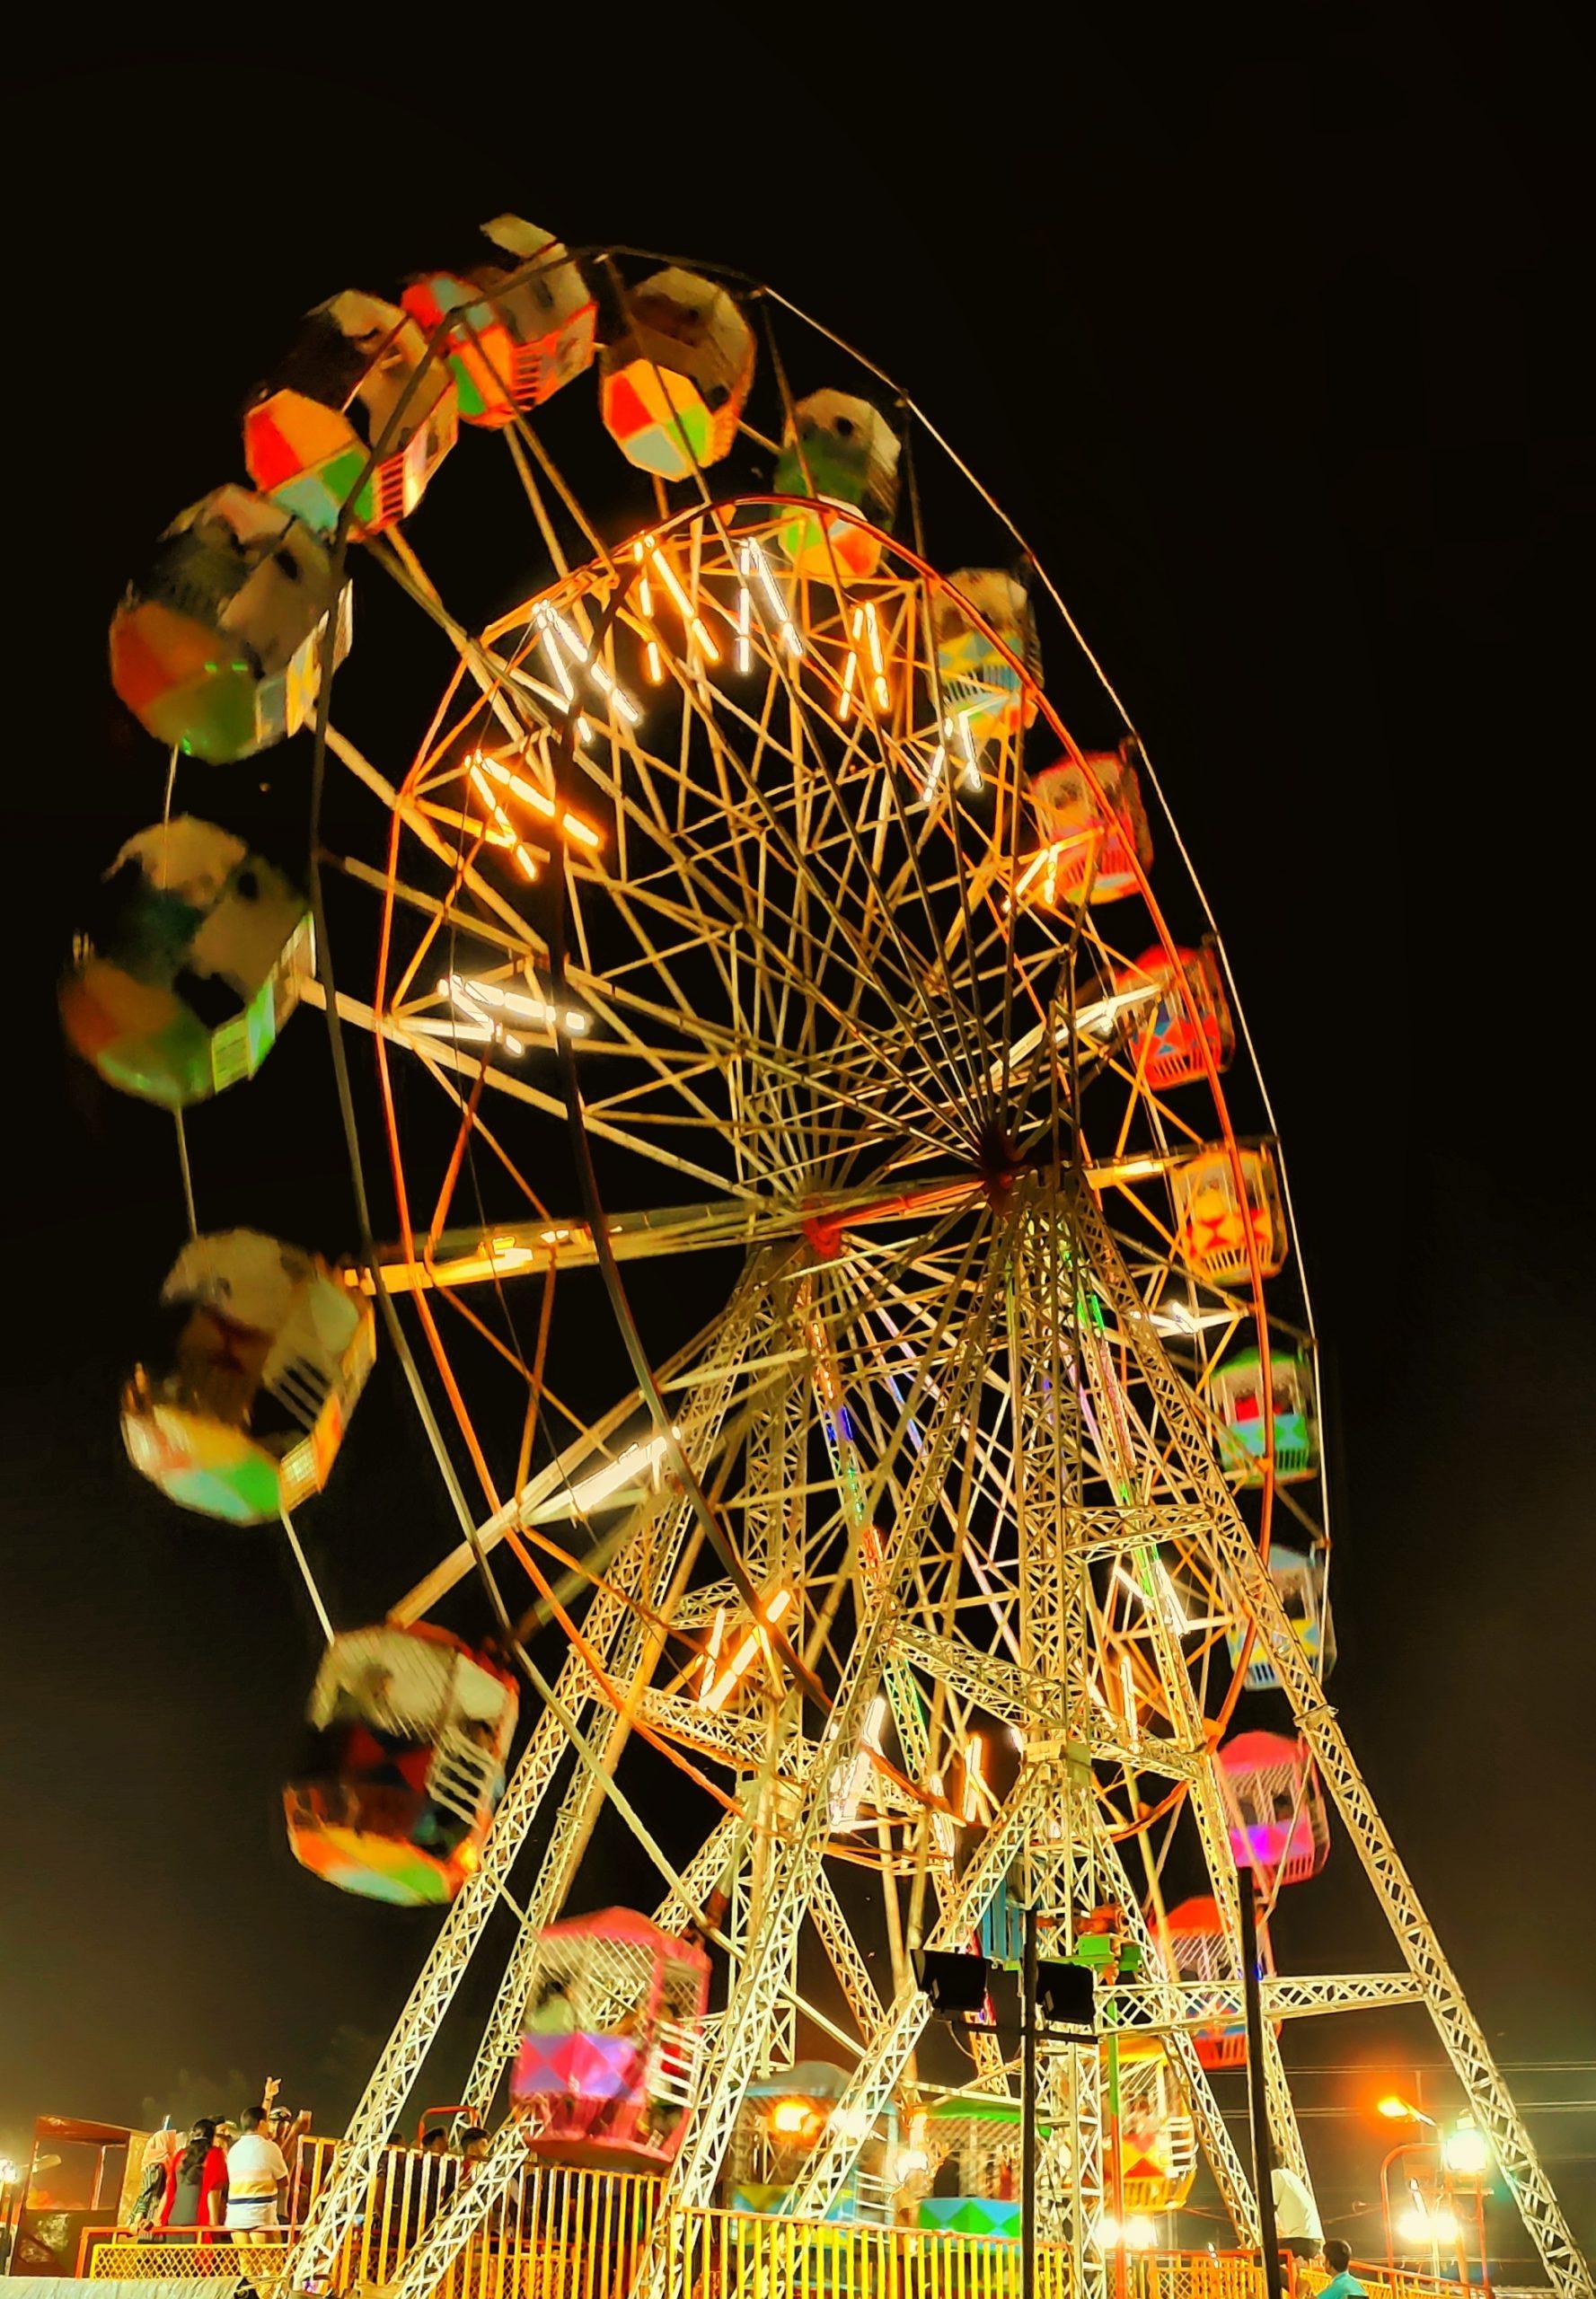 Big wheel in festival.